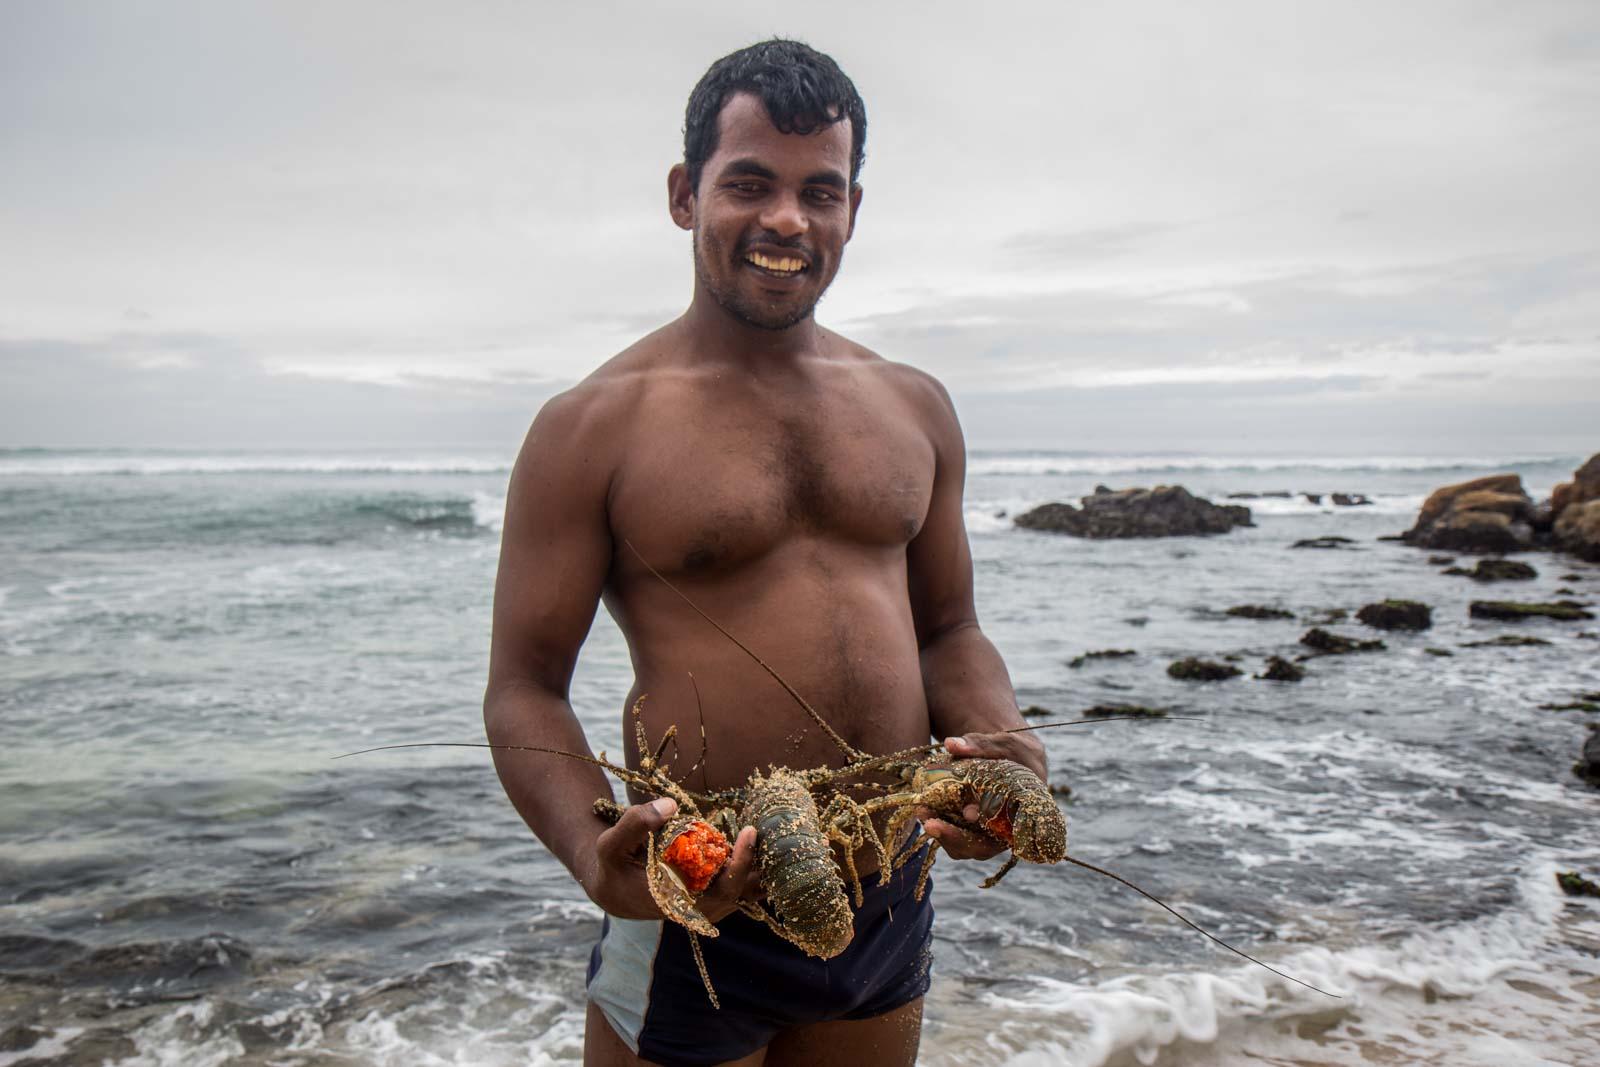 Weligama, Sri Lanka's south coast, beaches